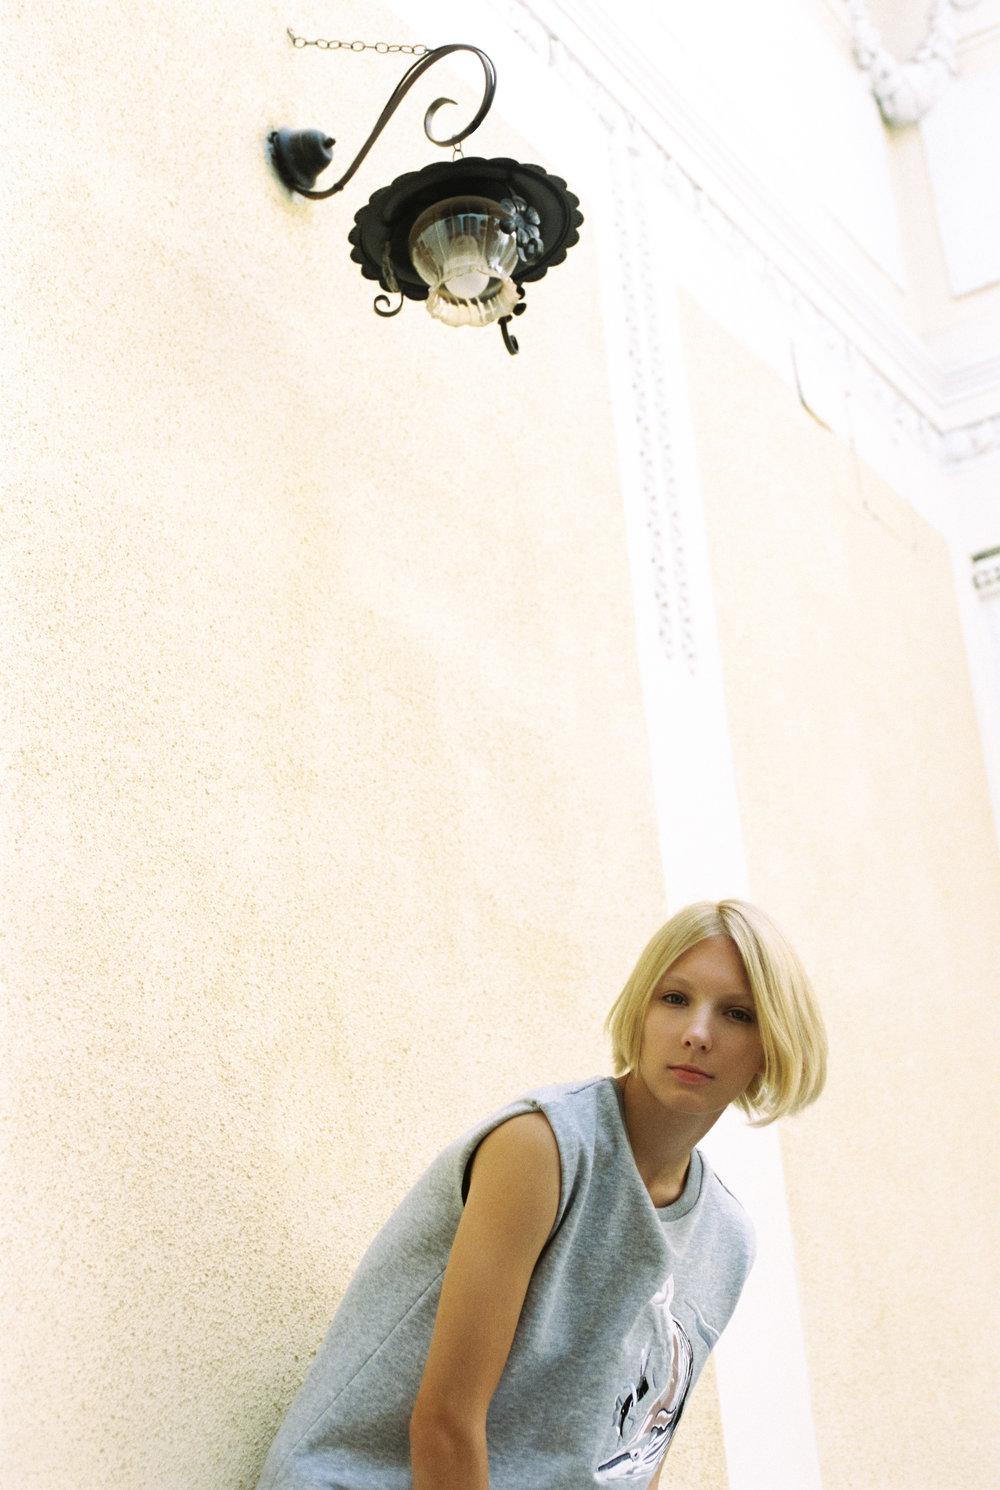 Bogilárka-Sáfrán-by-Jacqueline-Puwalski-23.jpg